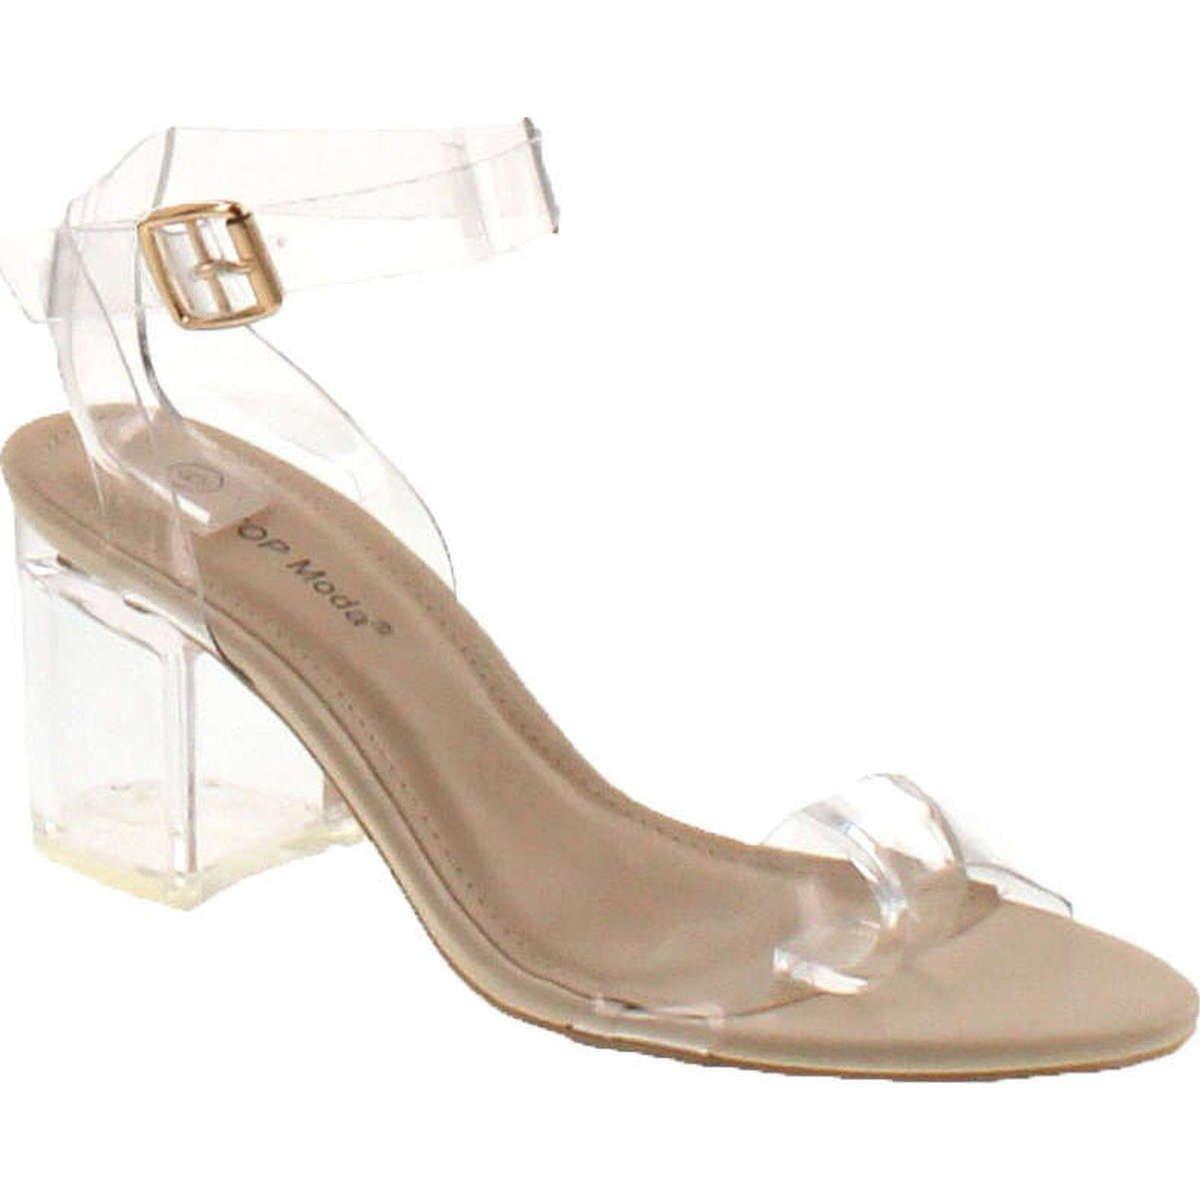 Top Moda Womens Ivan-1 Lucite Clear Strappy Block Chunky High Heel Open Peep Toe Sandal,Beige,7.5